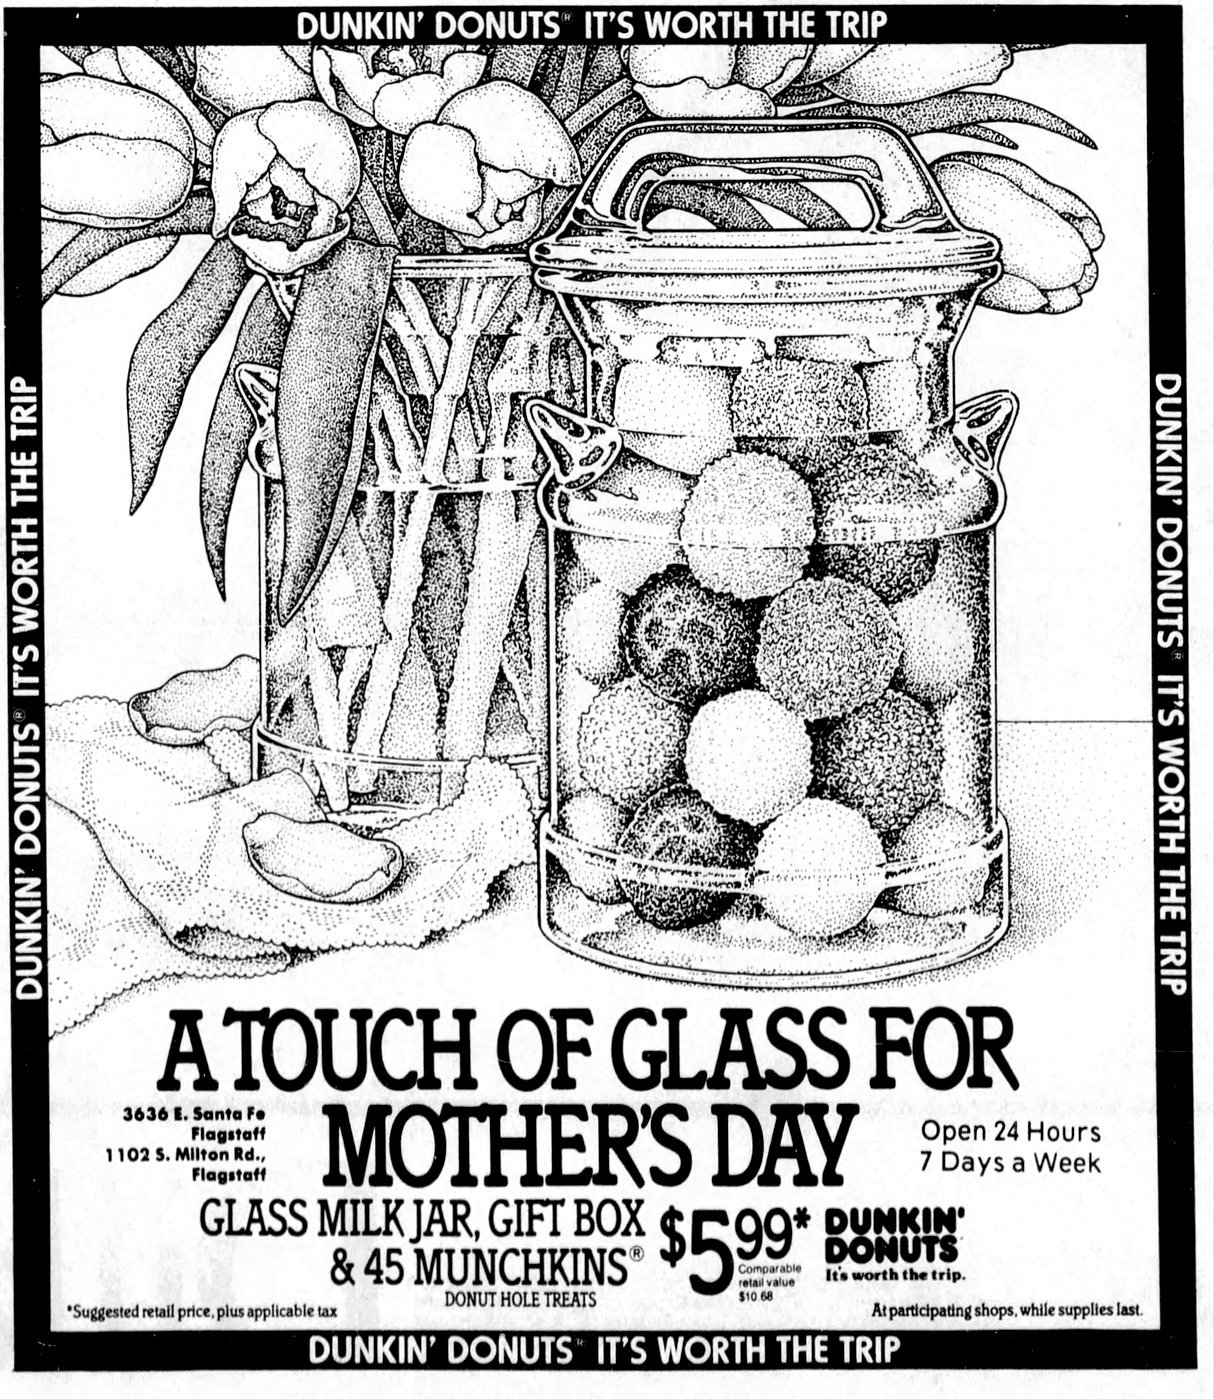 Dunkin Donuts vintage glass milk jar and Munchkins donut holes (1988)